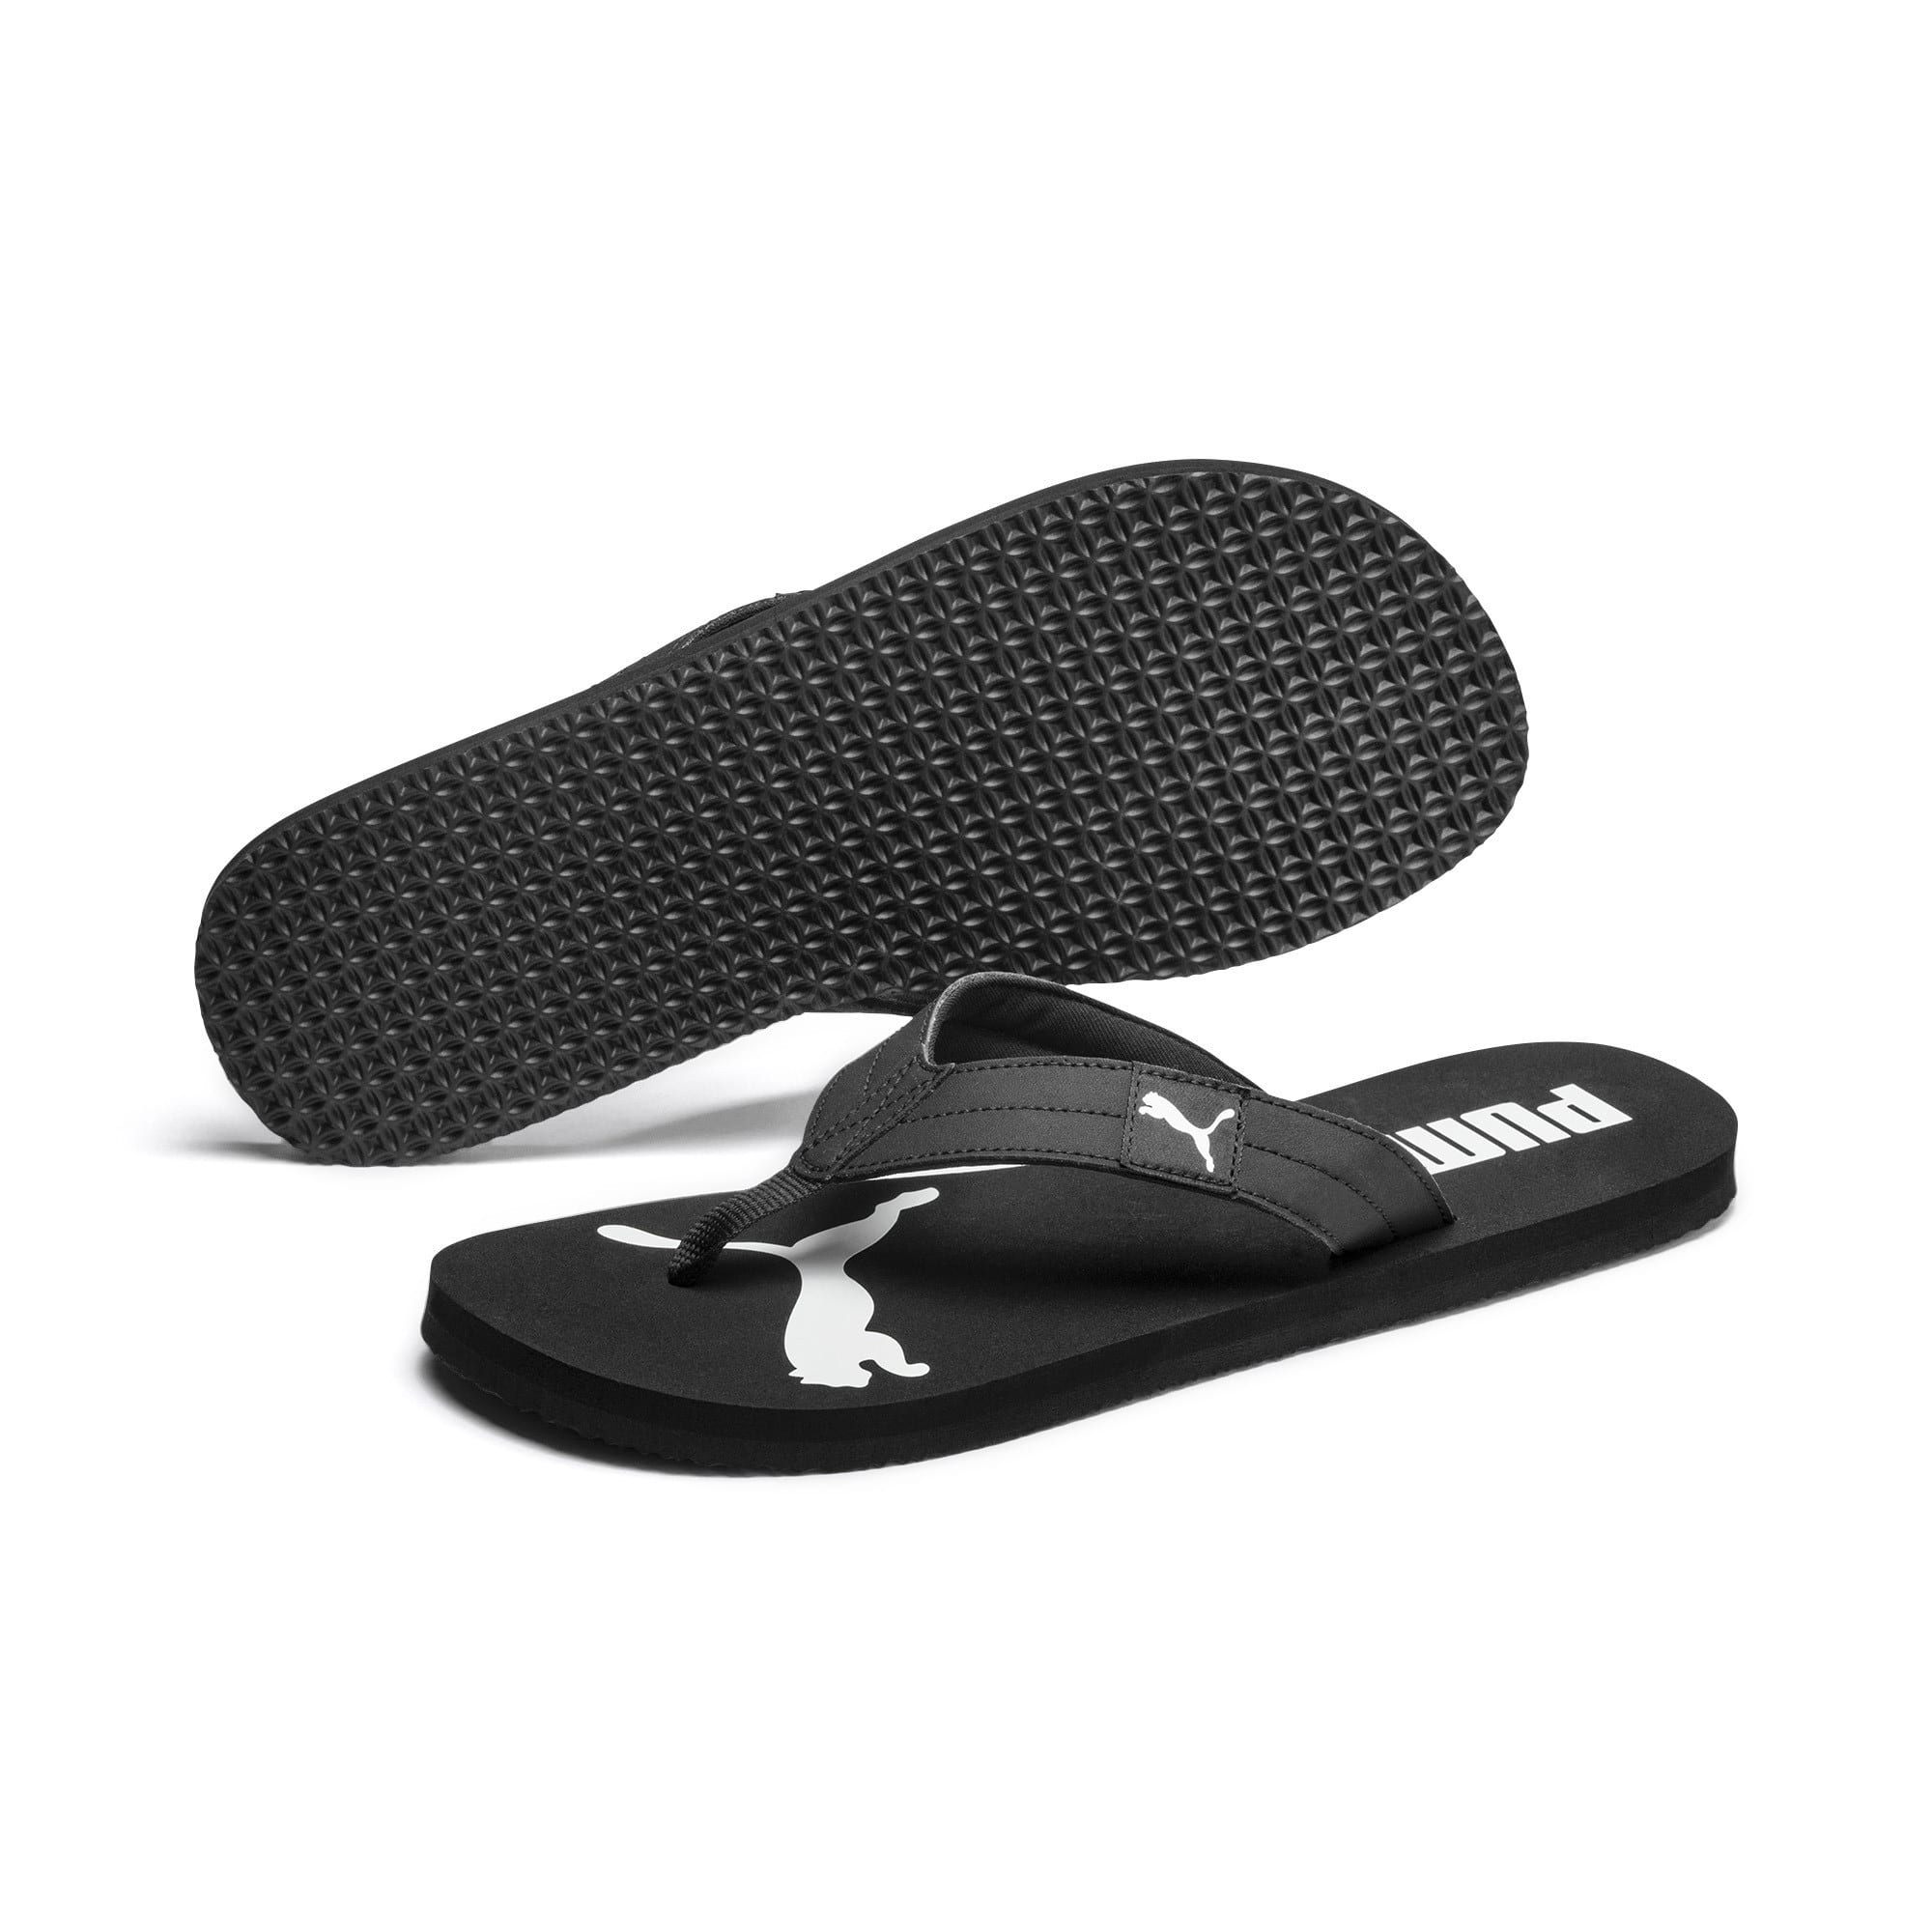 Thumbnail 2 of Cosy Flip Sandals, Puma Black-Puma White, medium